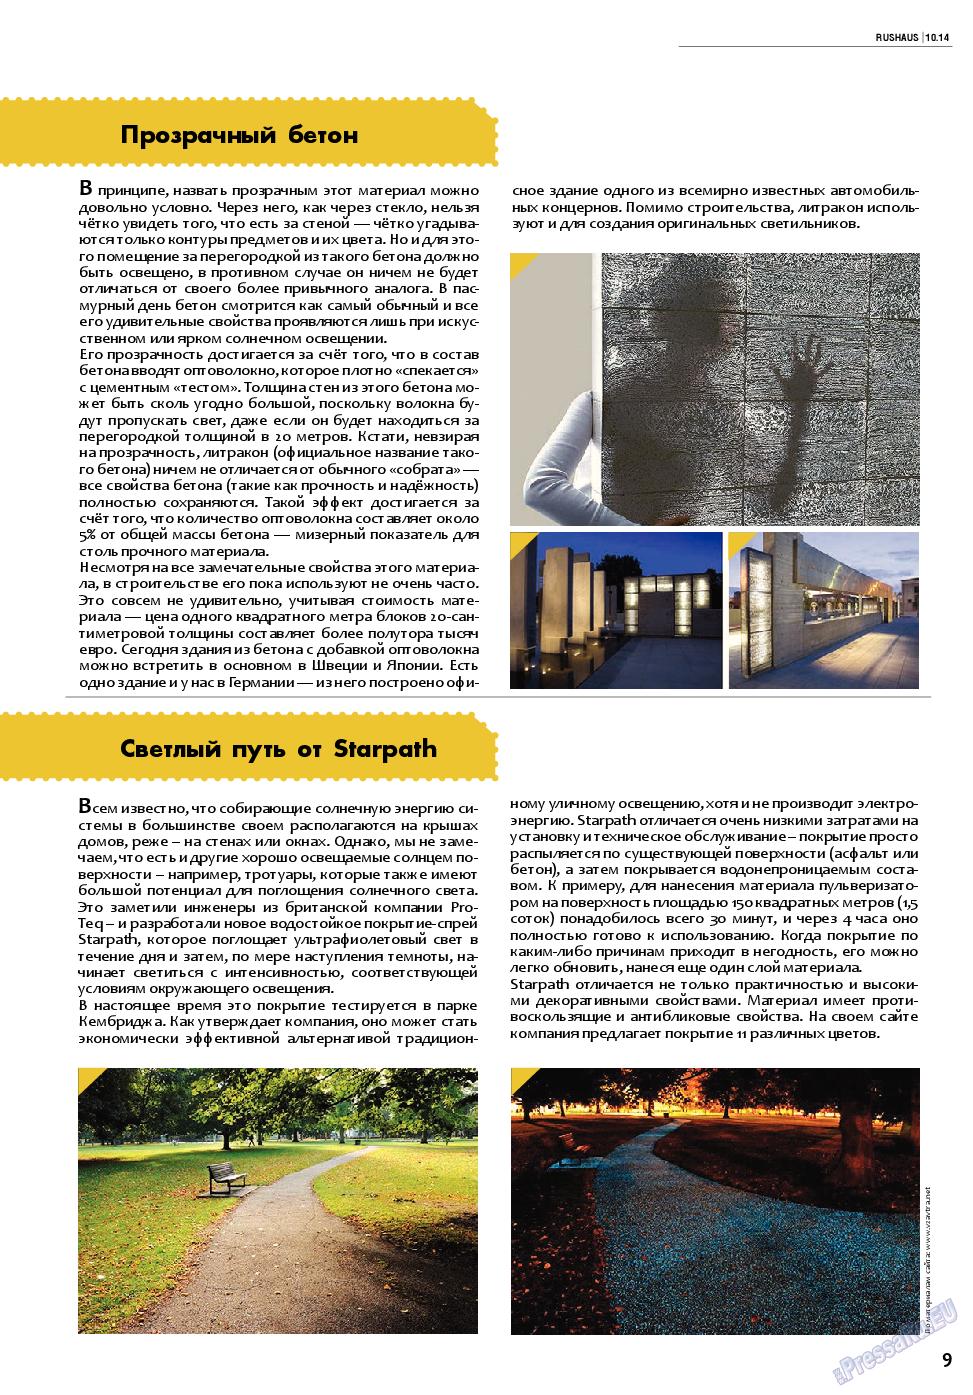 RusHaus (журнал). 2014 год, номер 2, стр. 9